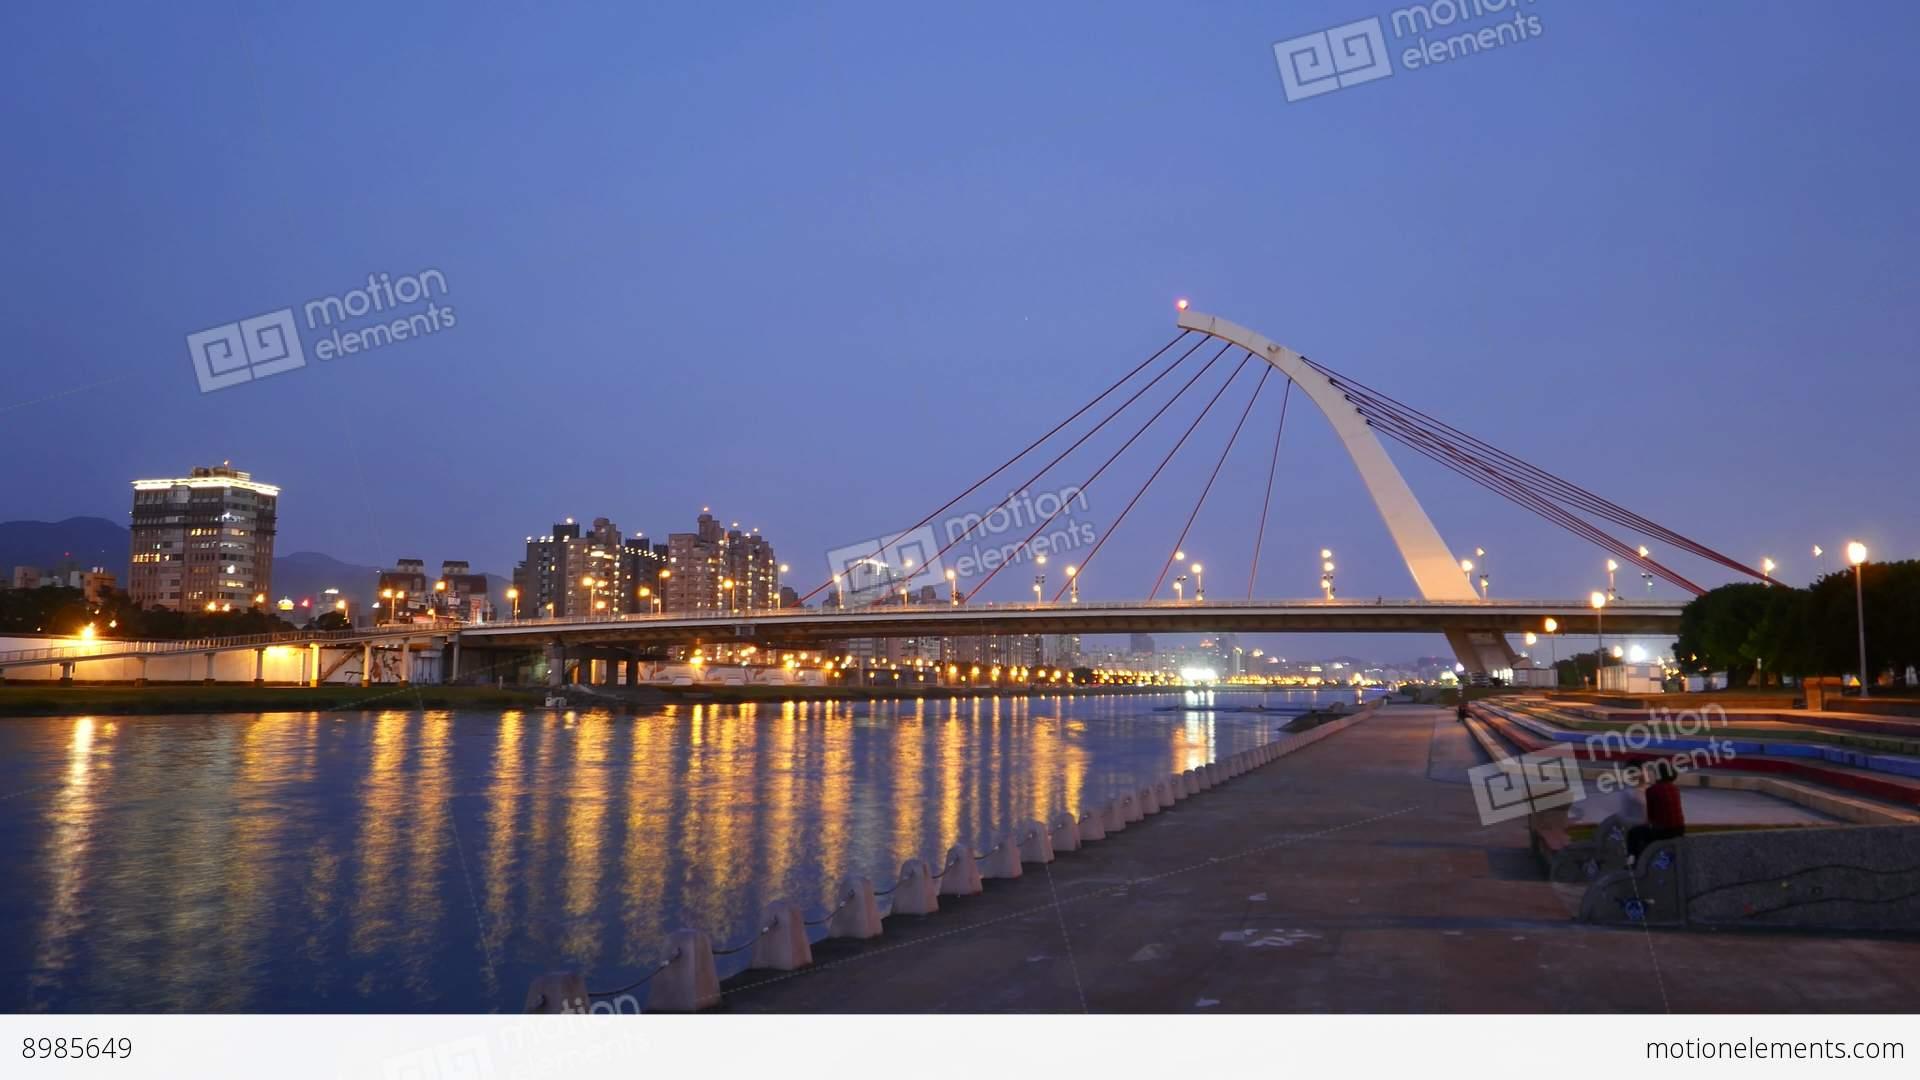 Dazhi Bridge From Dusk To Night Time Lapse, Keelung River